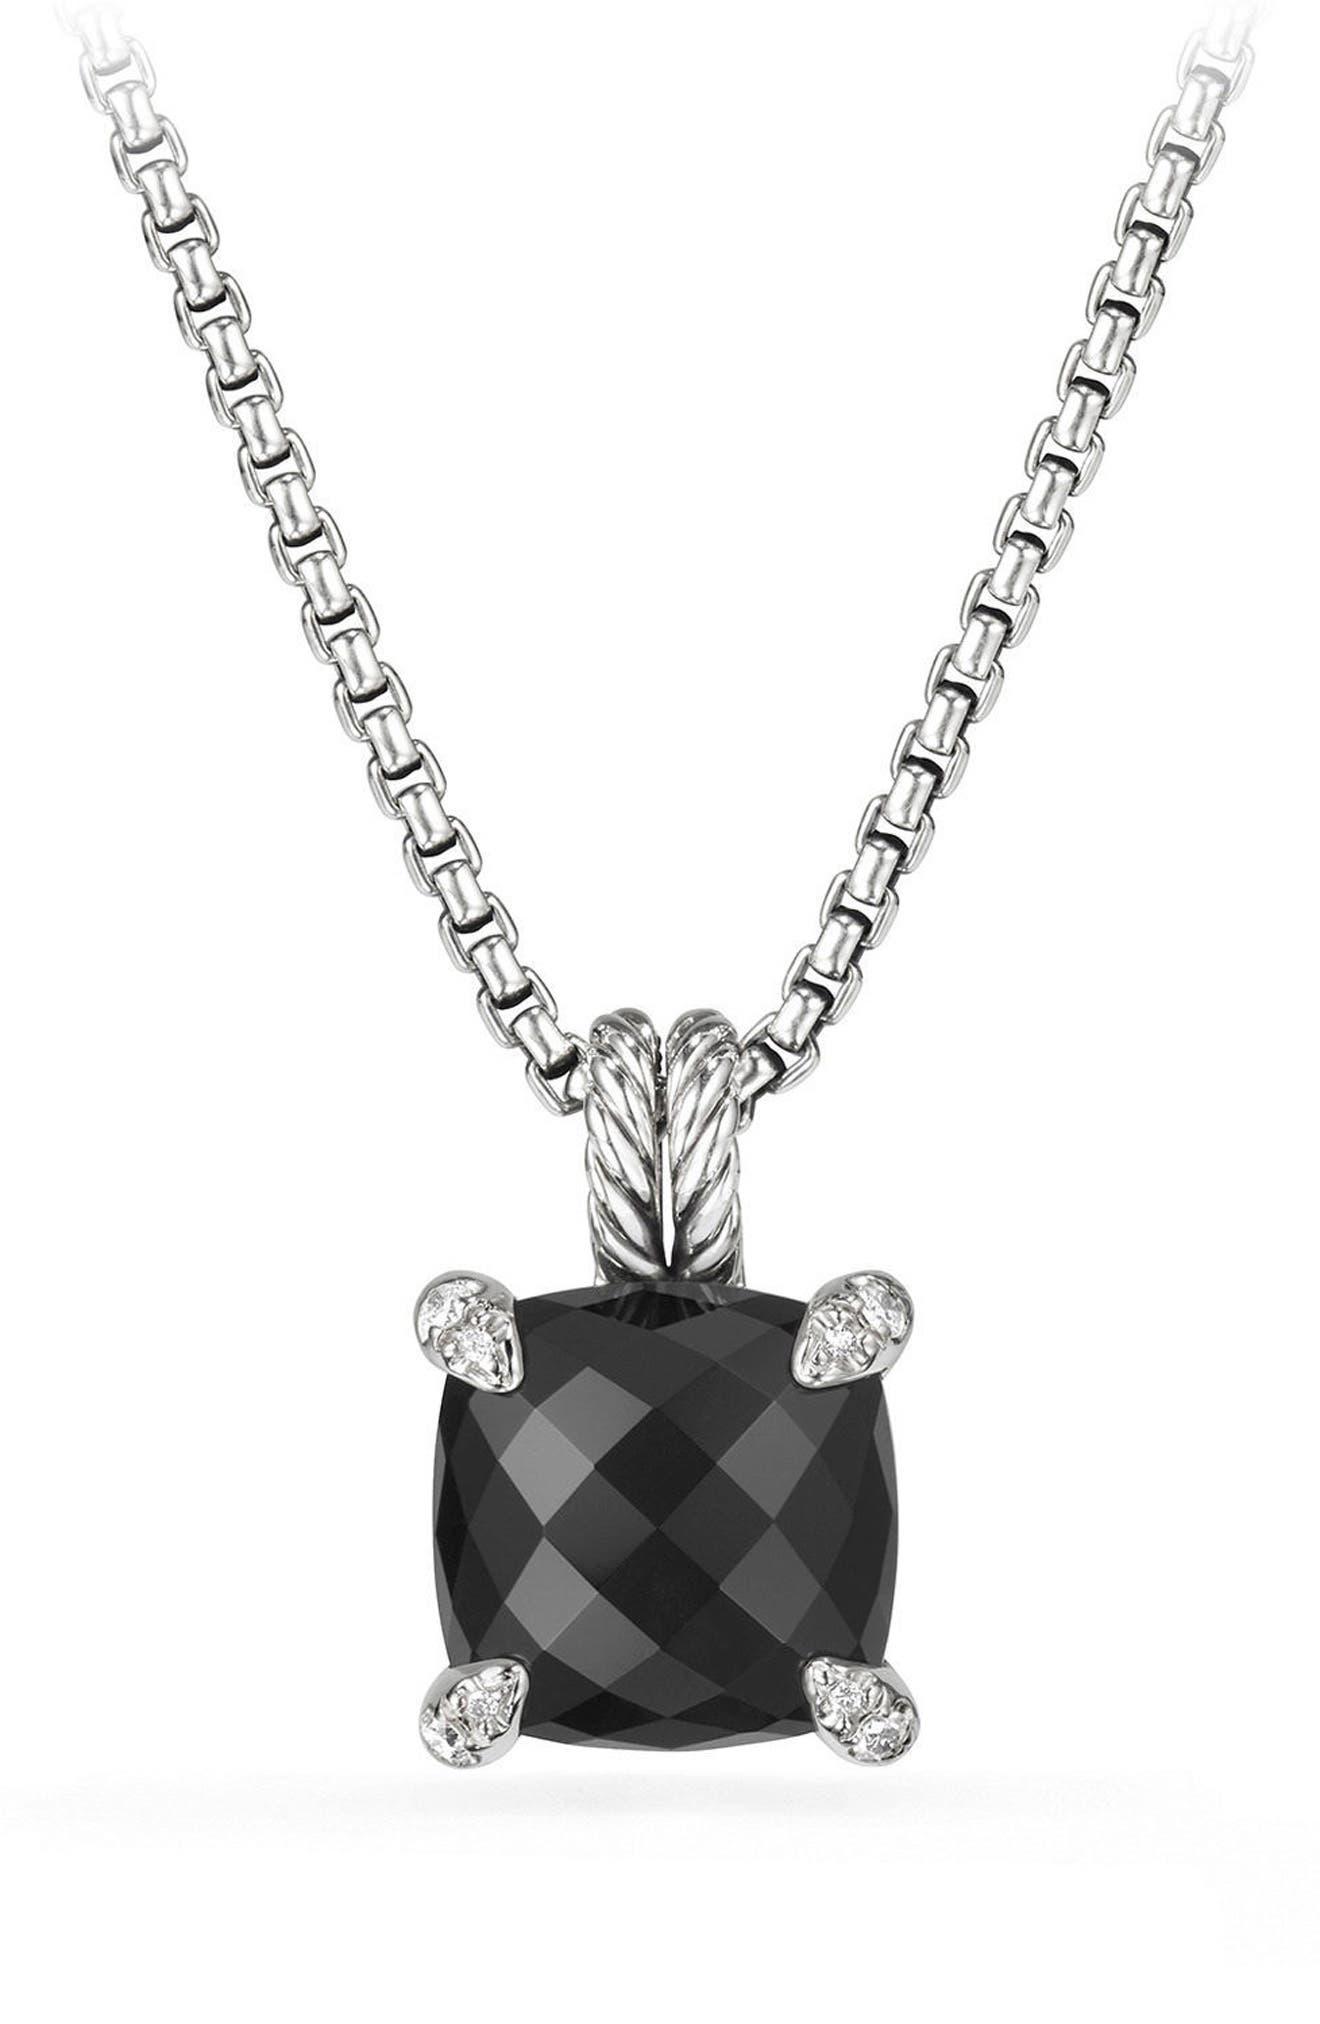 Châtelaine Pendant Necklace with Black Onyx and Diamonds,                             Main thumbnail 1, color,                             BLACK ONYX